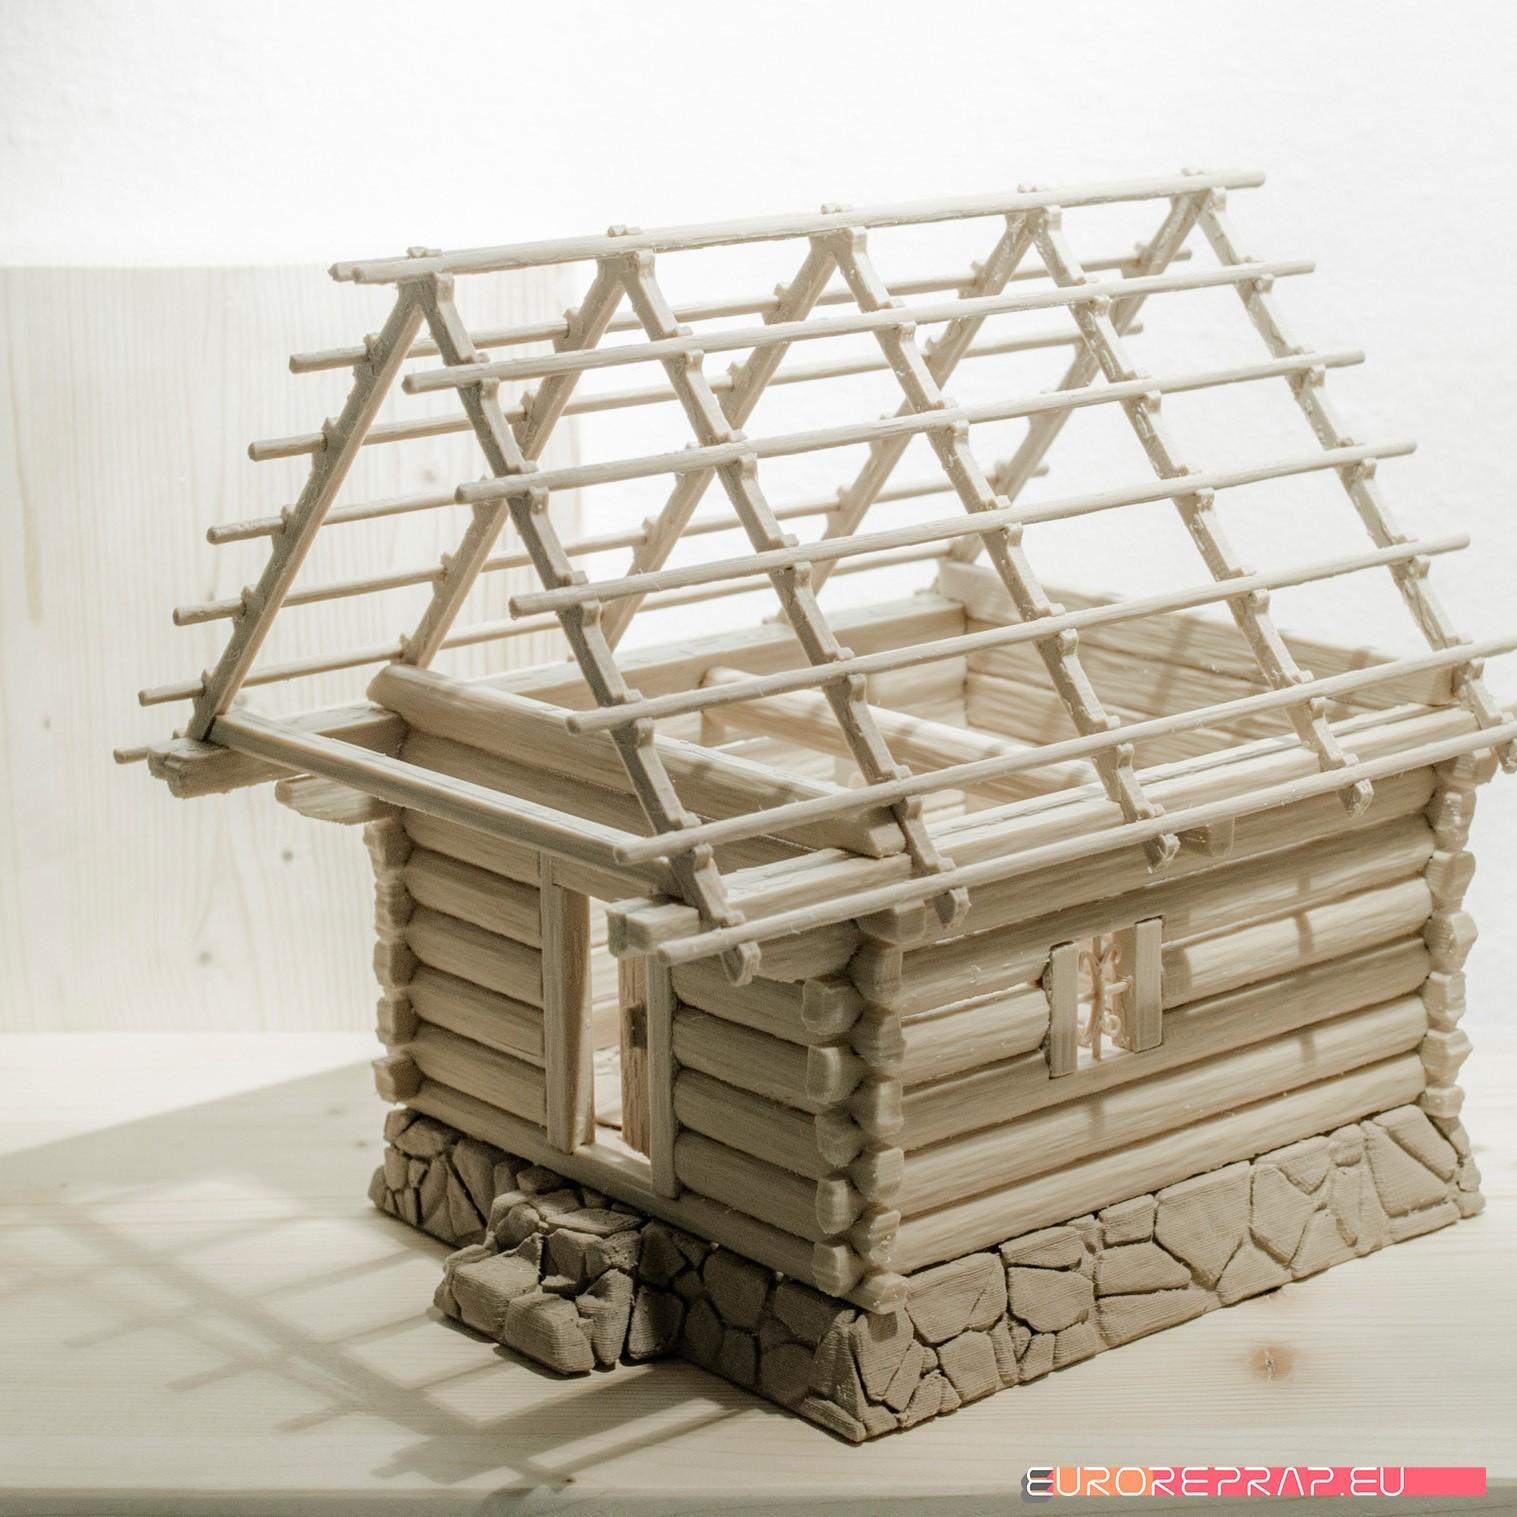 P03.jpg Download STL file 3D printed house - log cabin - cottage • 3D printable template, euroreprap_eu